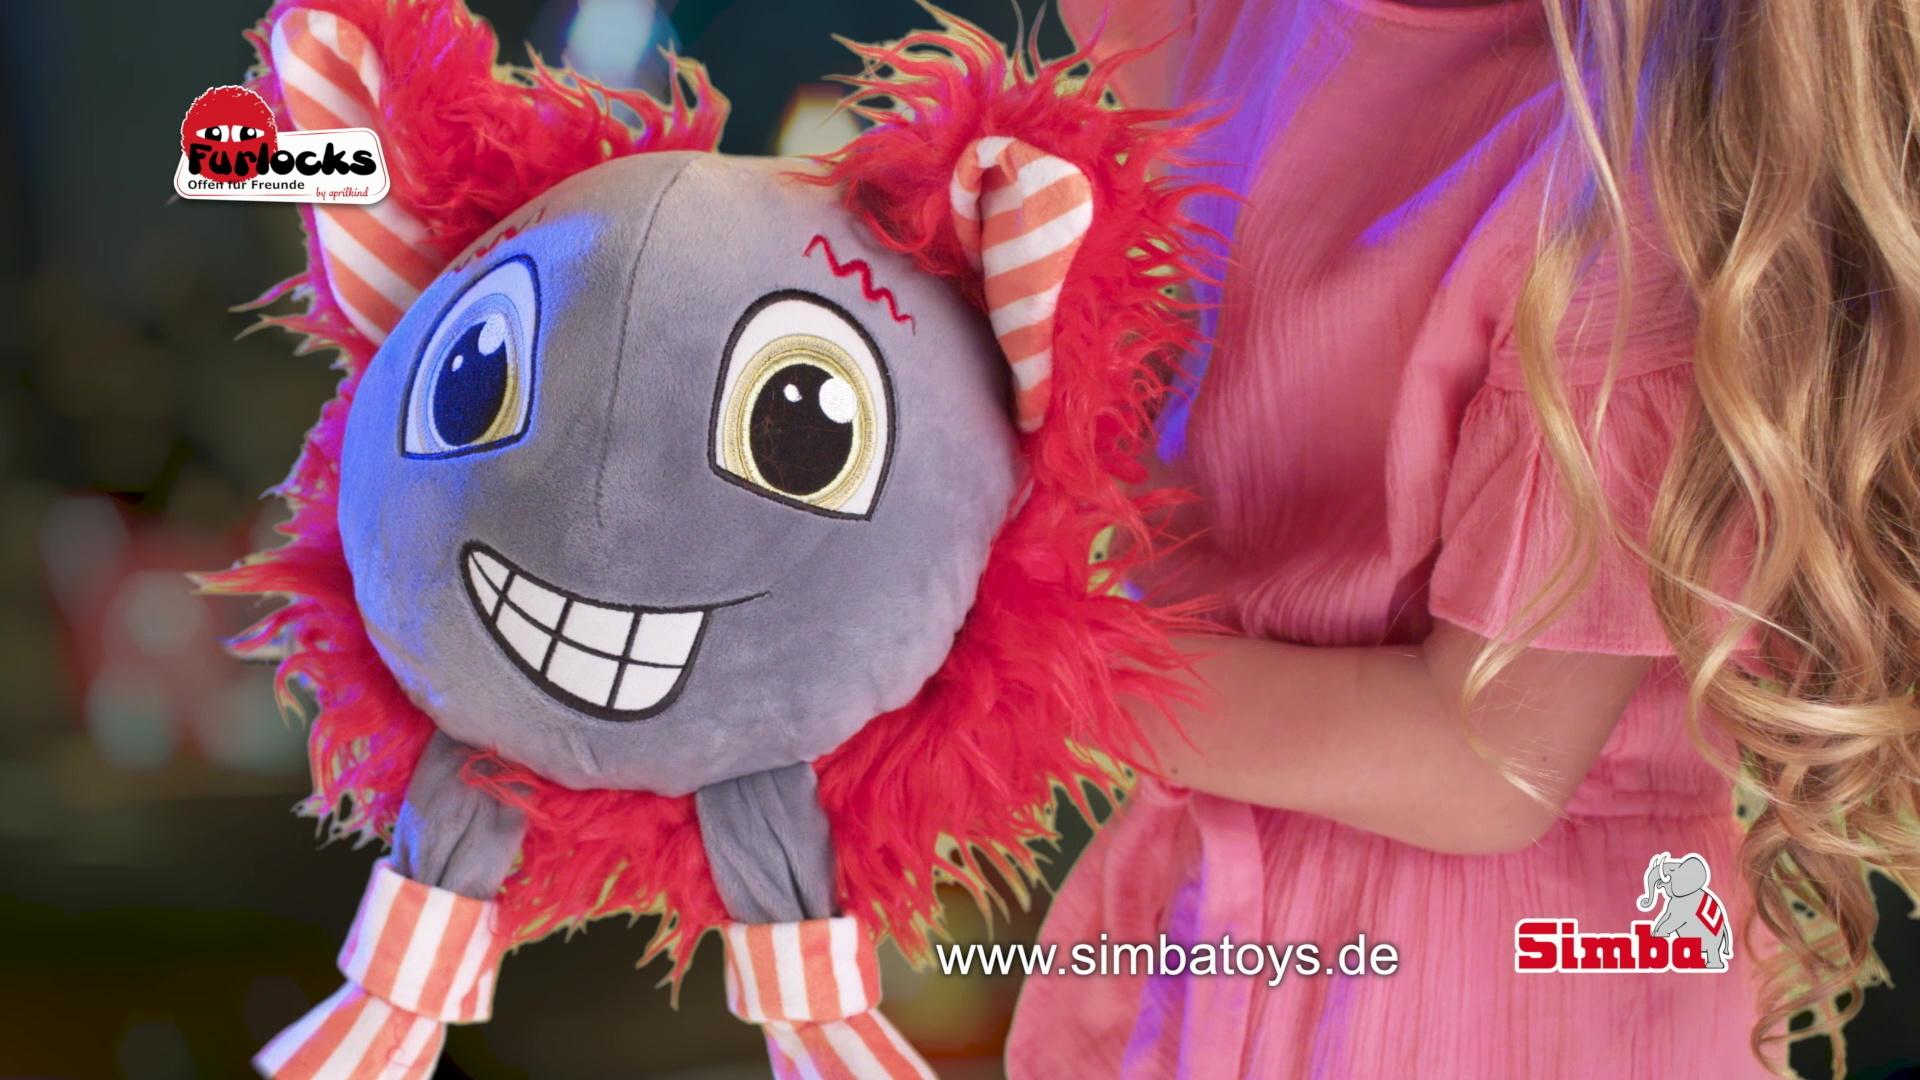 Https Video Simba Dickie Com De Simba